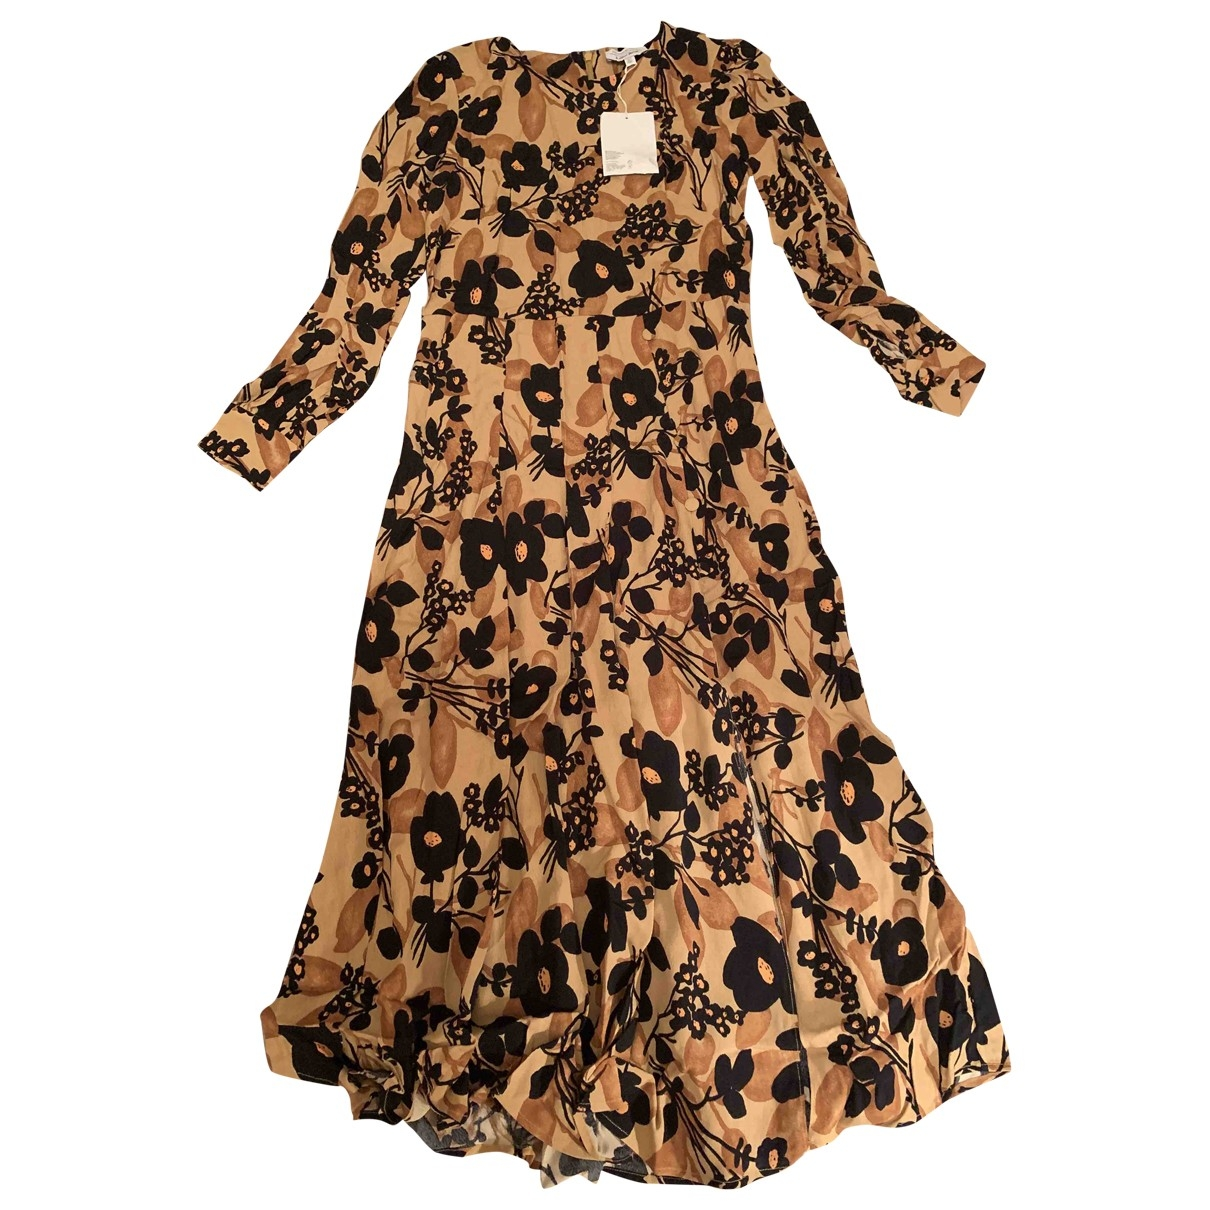 & Stories \N Multicolour dress for Women 6 US